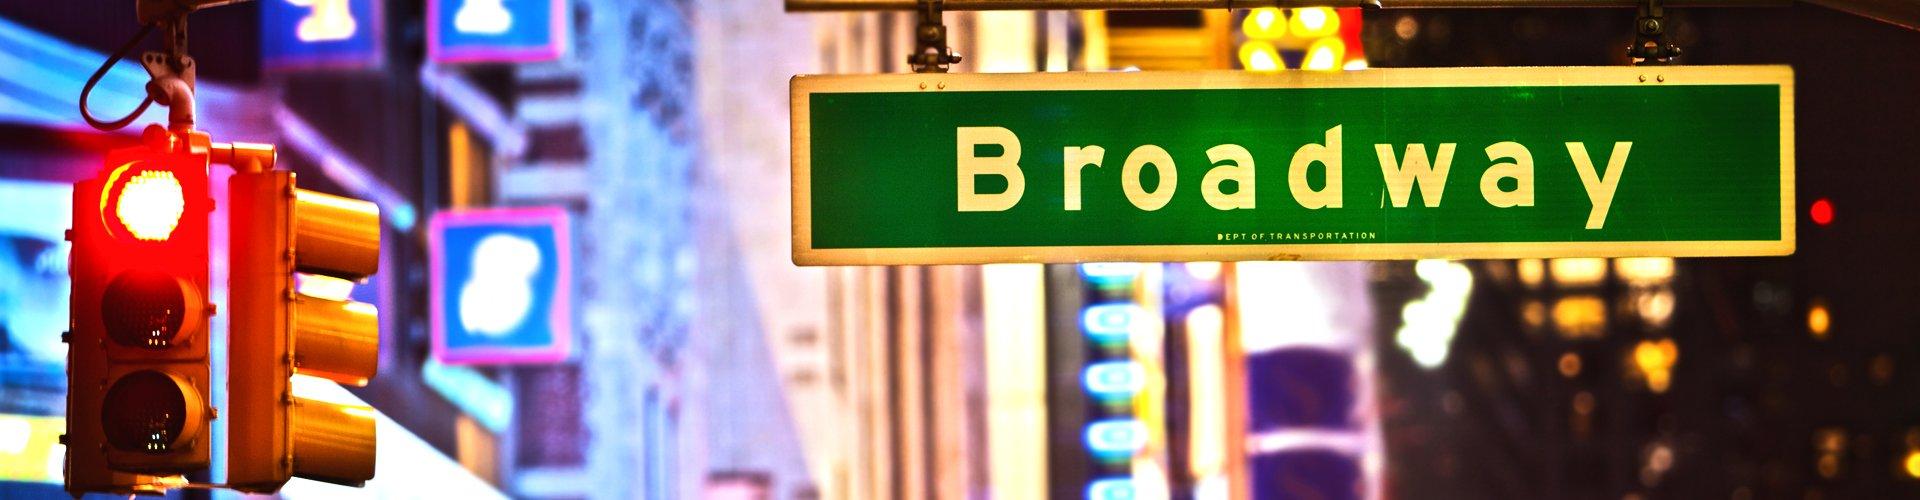 Broadway in New York, Amerika